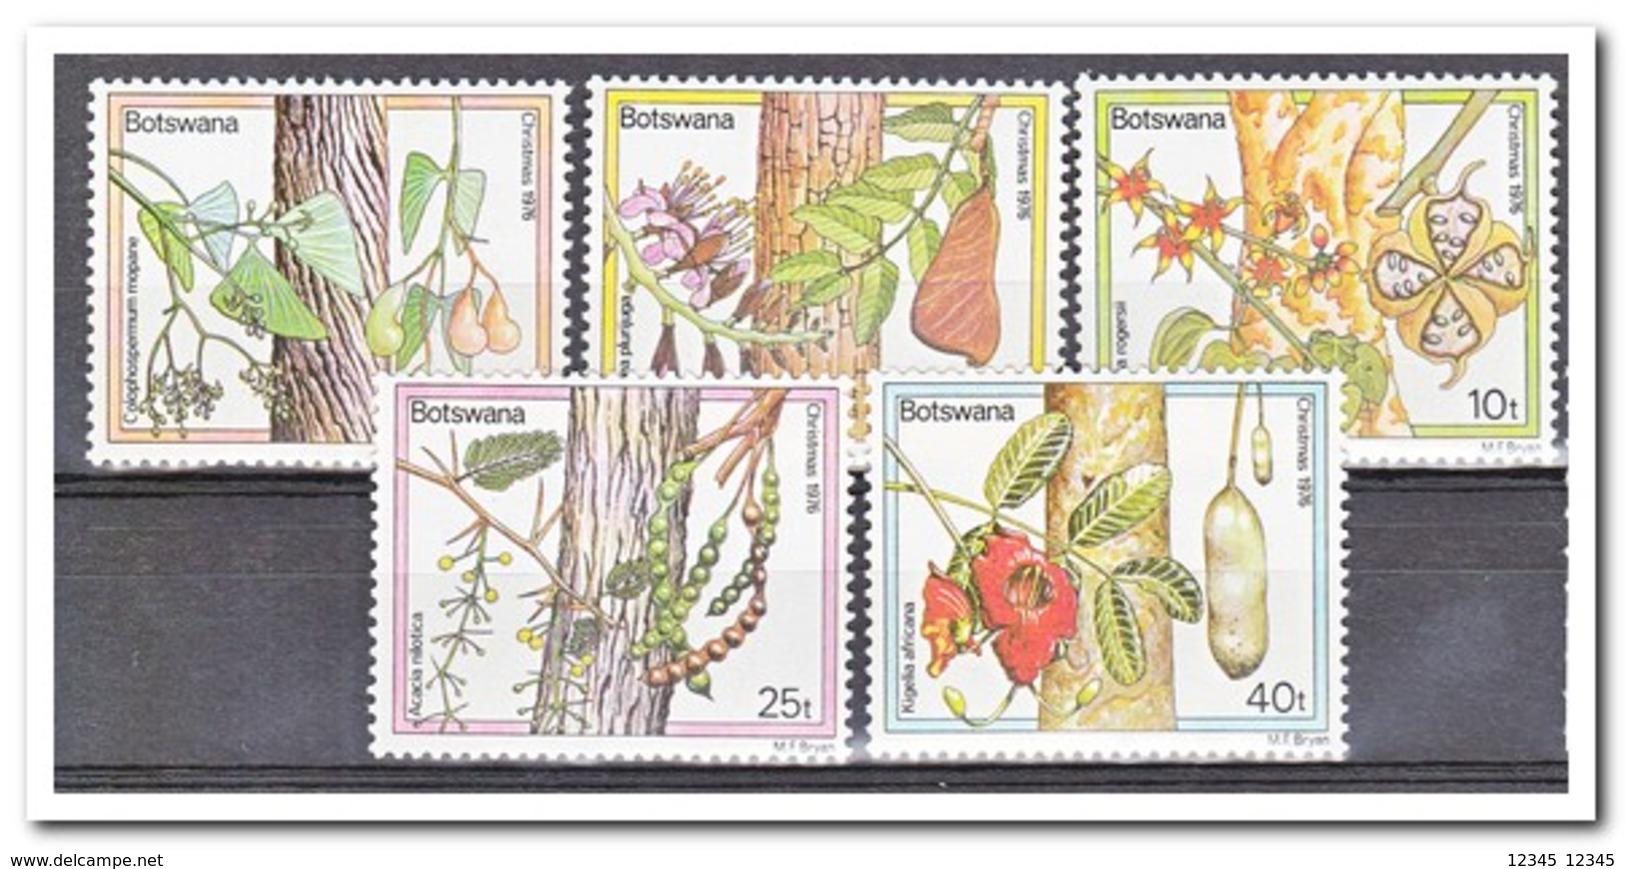 Botswana 1976, Postfris MNH, Trees, Christmas - Botswana (1966-...)